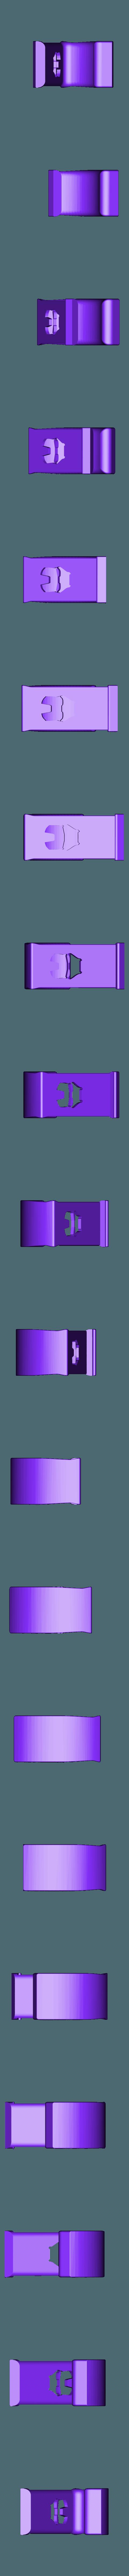 ironman.STL Download STL file Ironman Phone Holder • 3D print model, IceKiwi